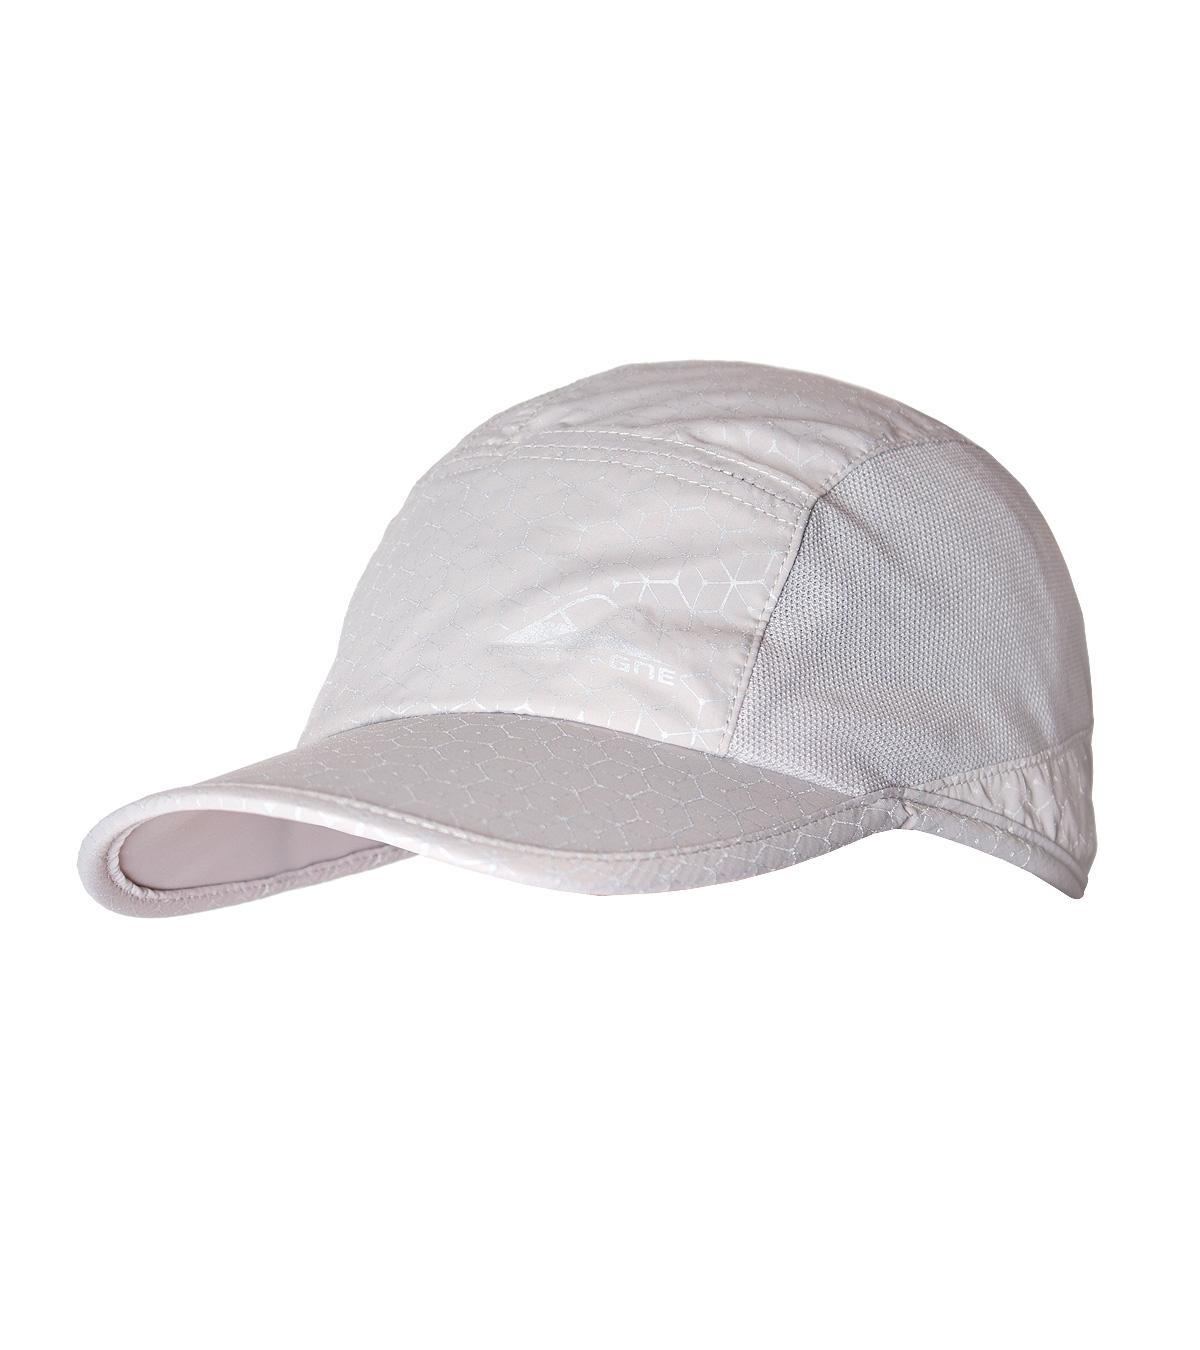 Gorro Flash Cap